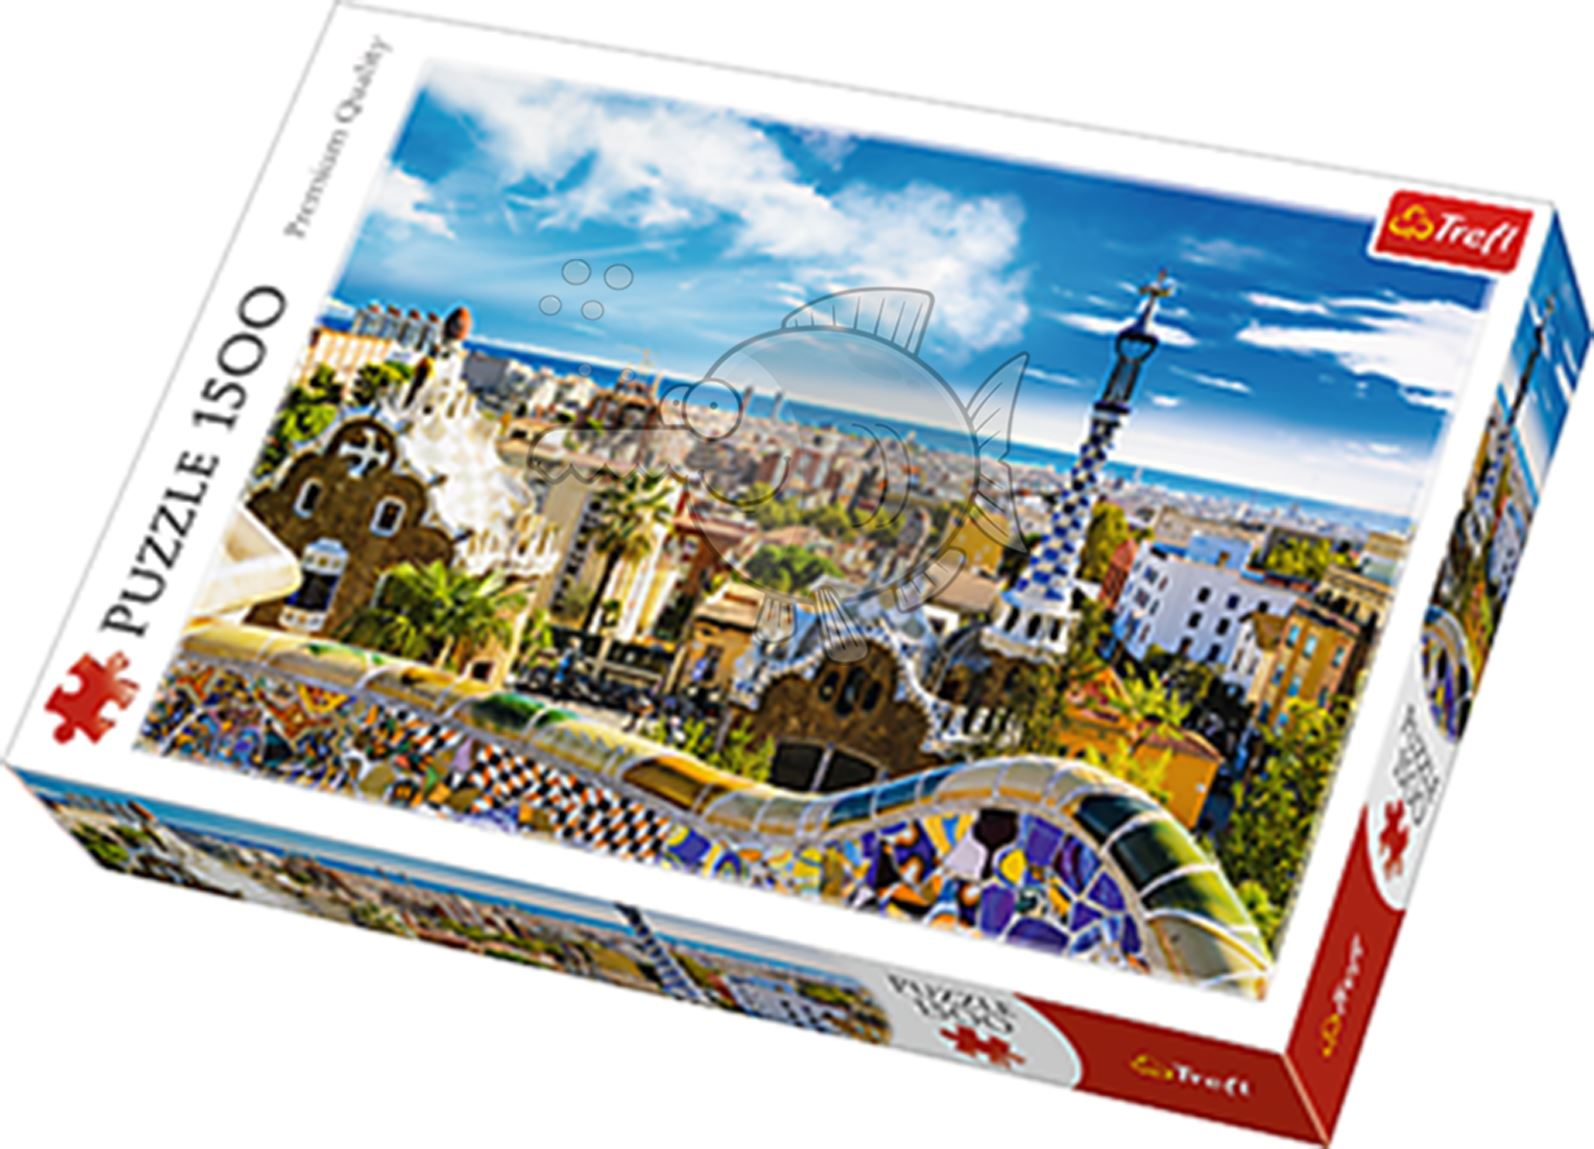 Trefl-300-500-1000-1500-2000-3000-4000-6000-Piece-Jigsaw-Puzzle-Landscapes-City thumbnail 257